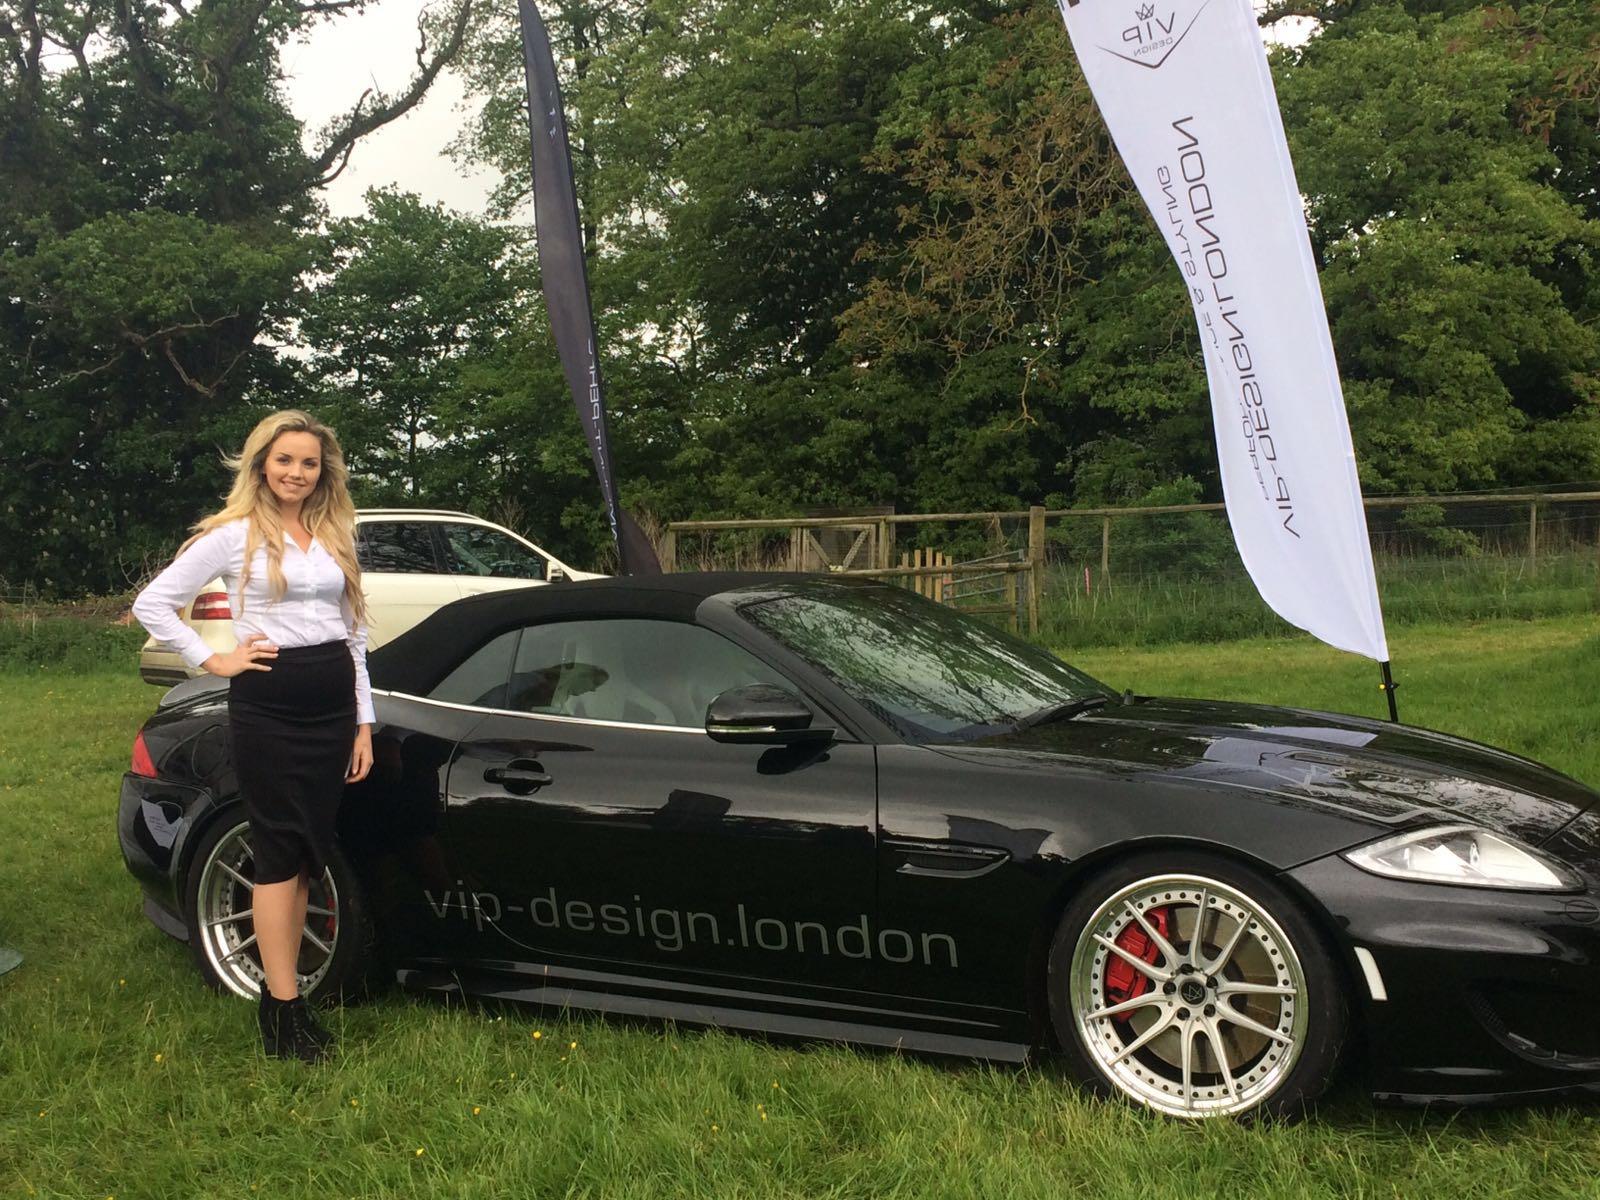 Promo Model – VIP Design London – Cotswold Jaguar Festival at Sudely Castle